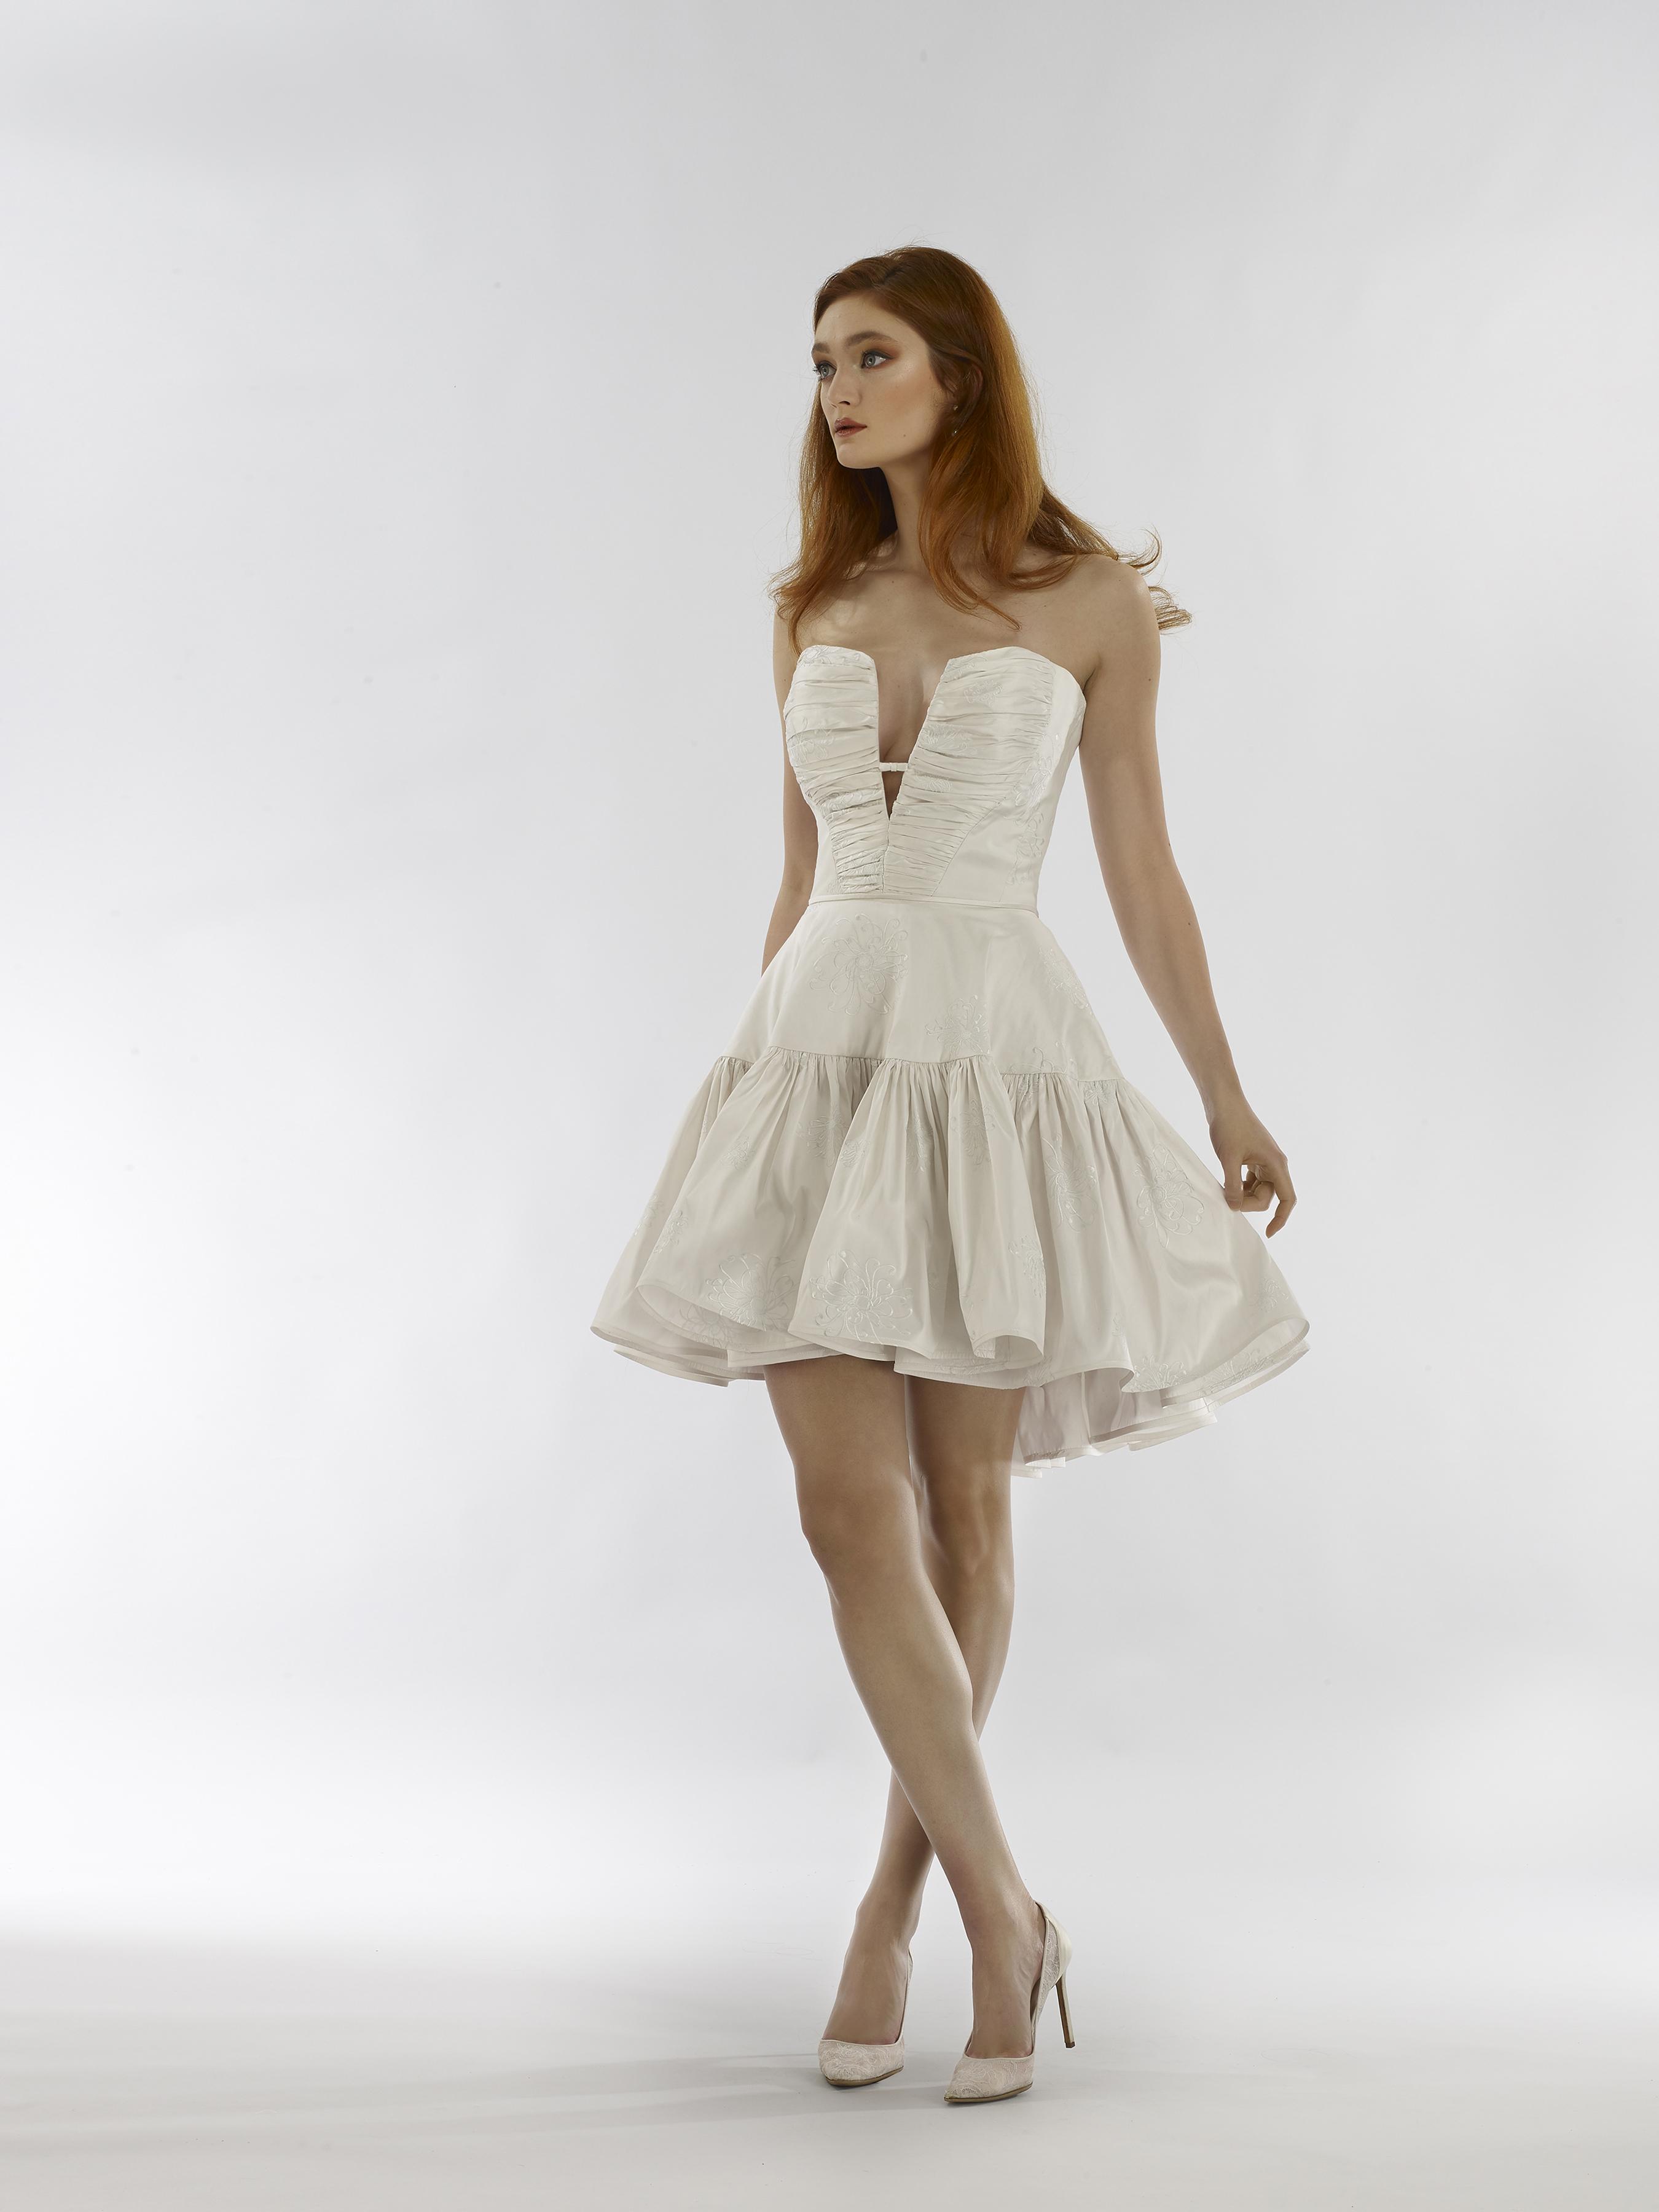 steven birnbaum spring 2020 wedding dress plunging sweetheart a-line short